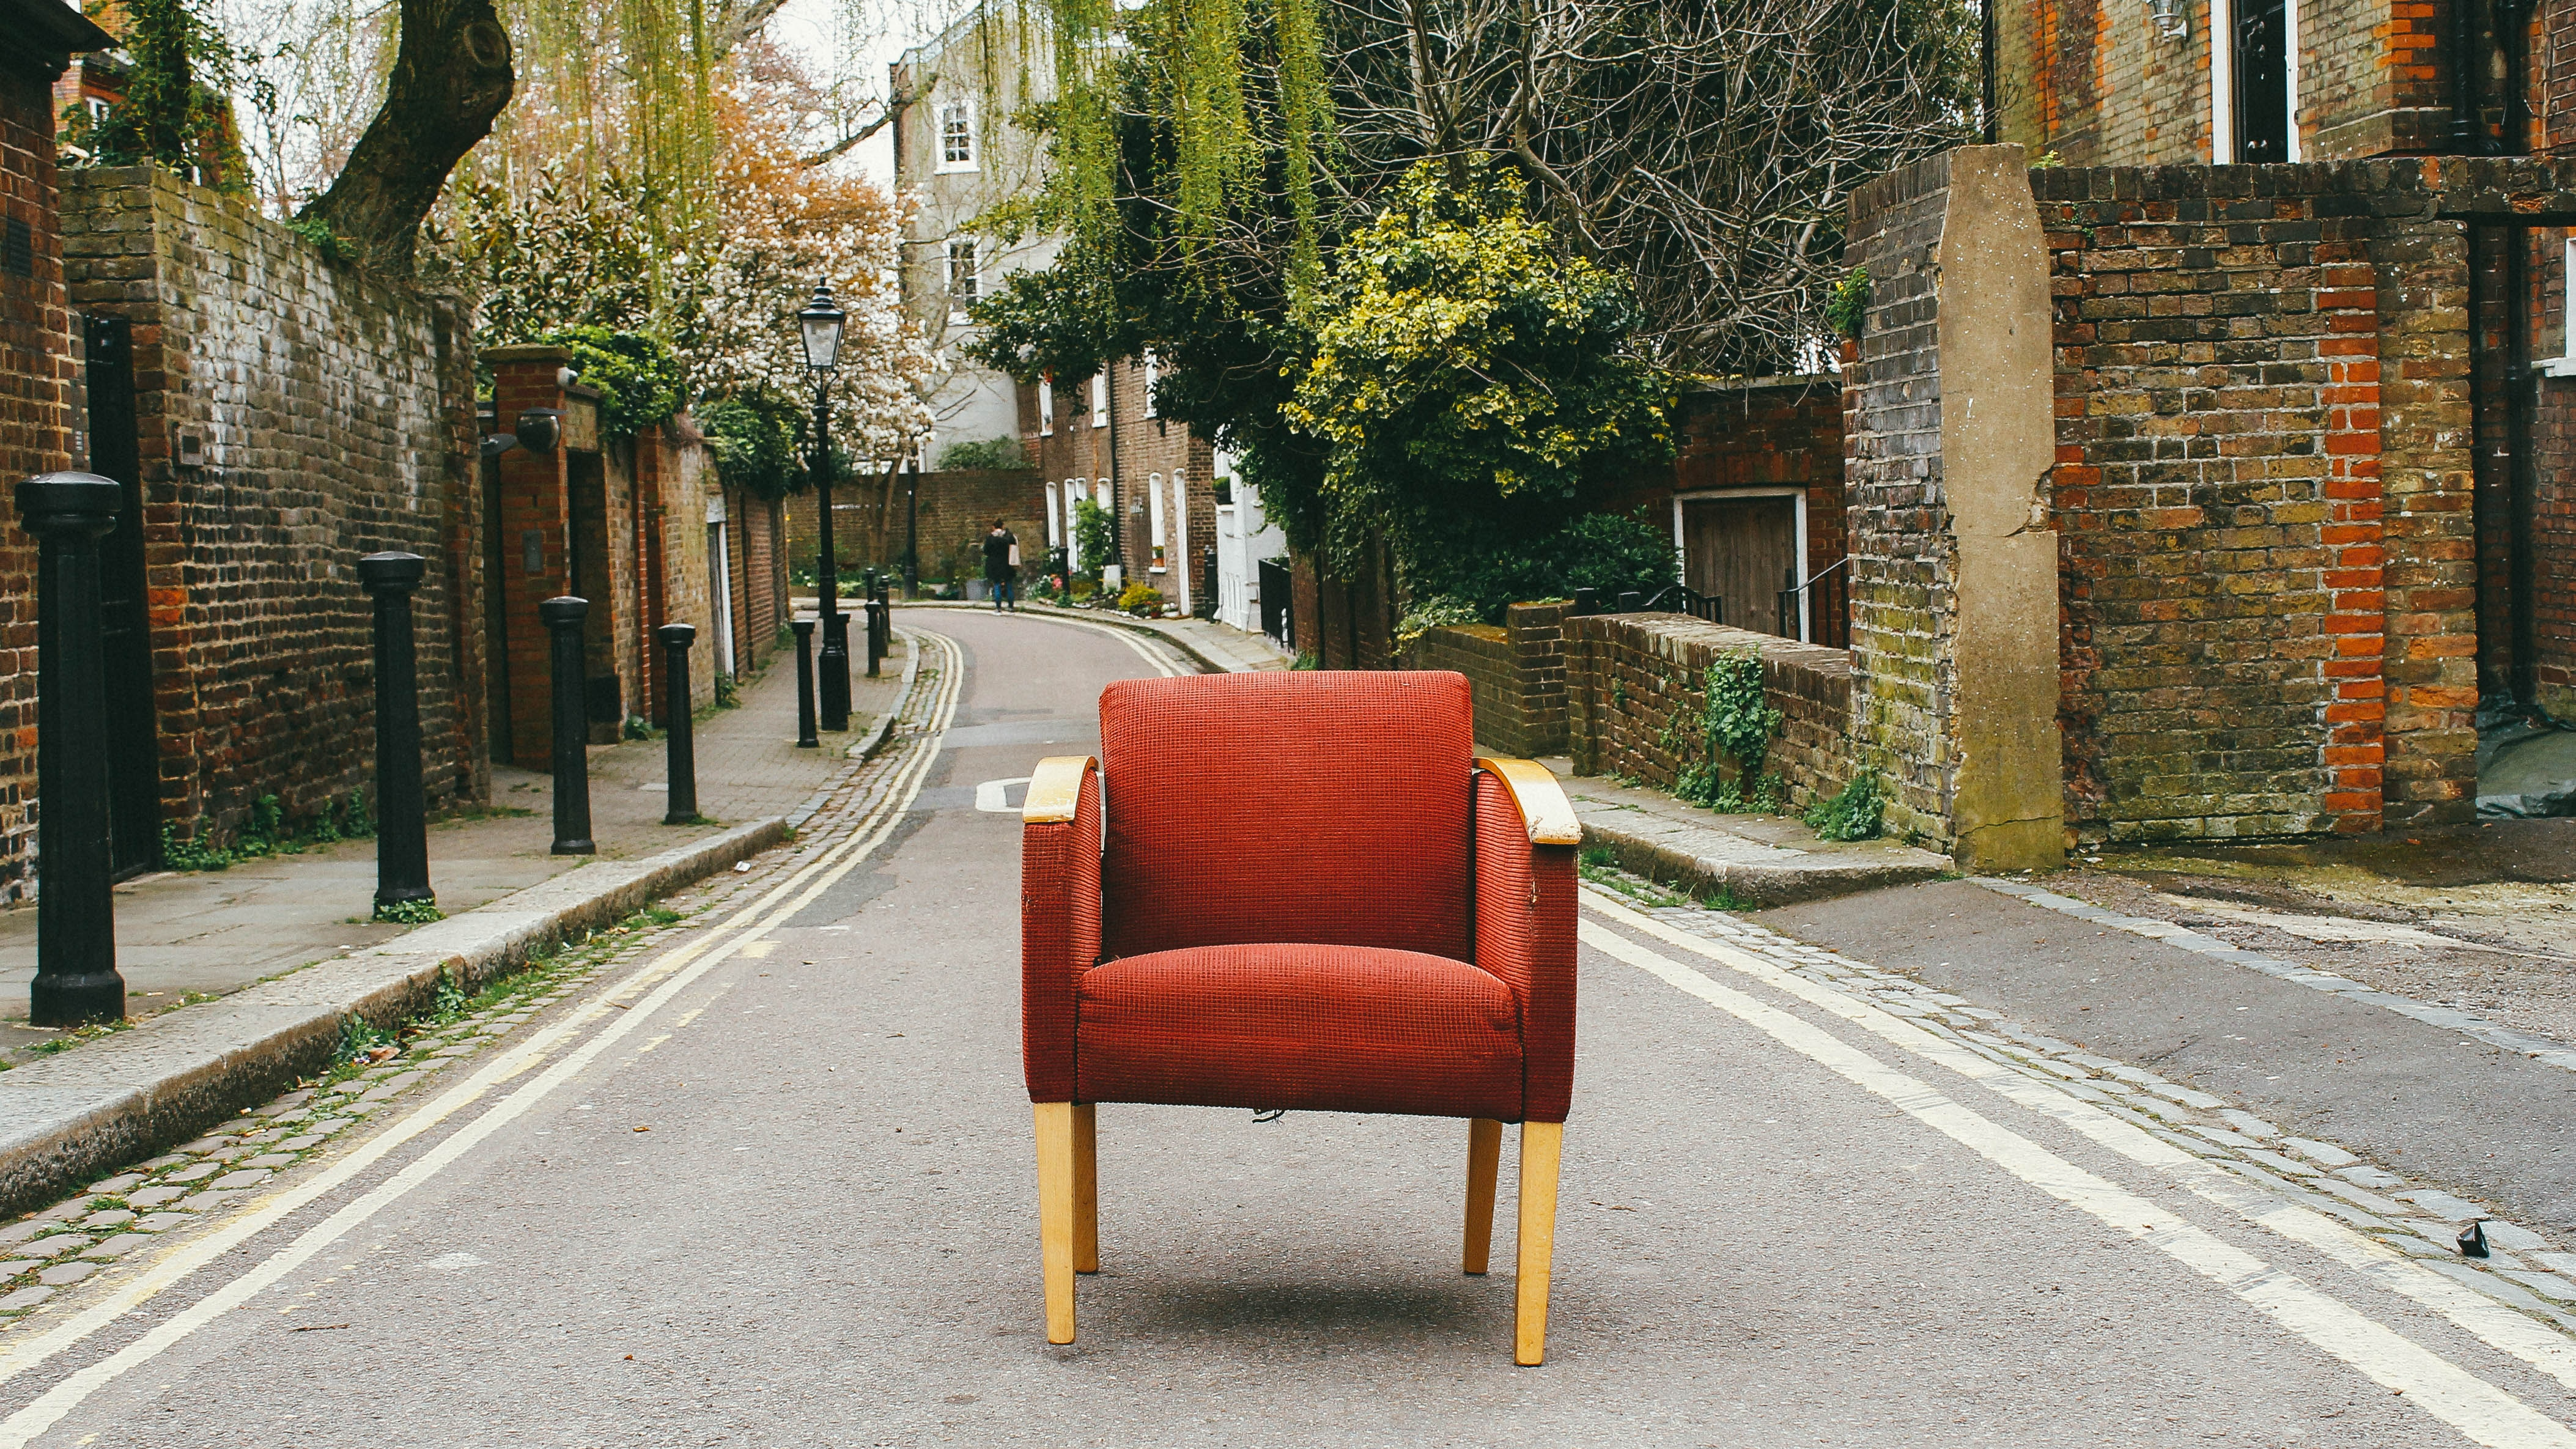 Eduard Militaru's photo of orange chair on the street